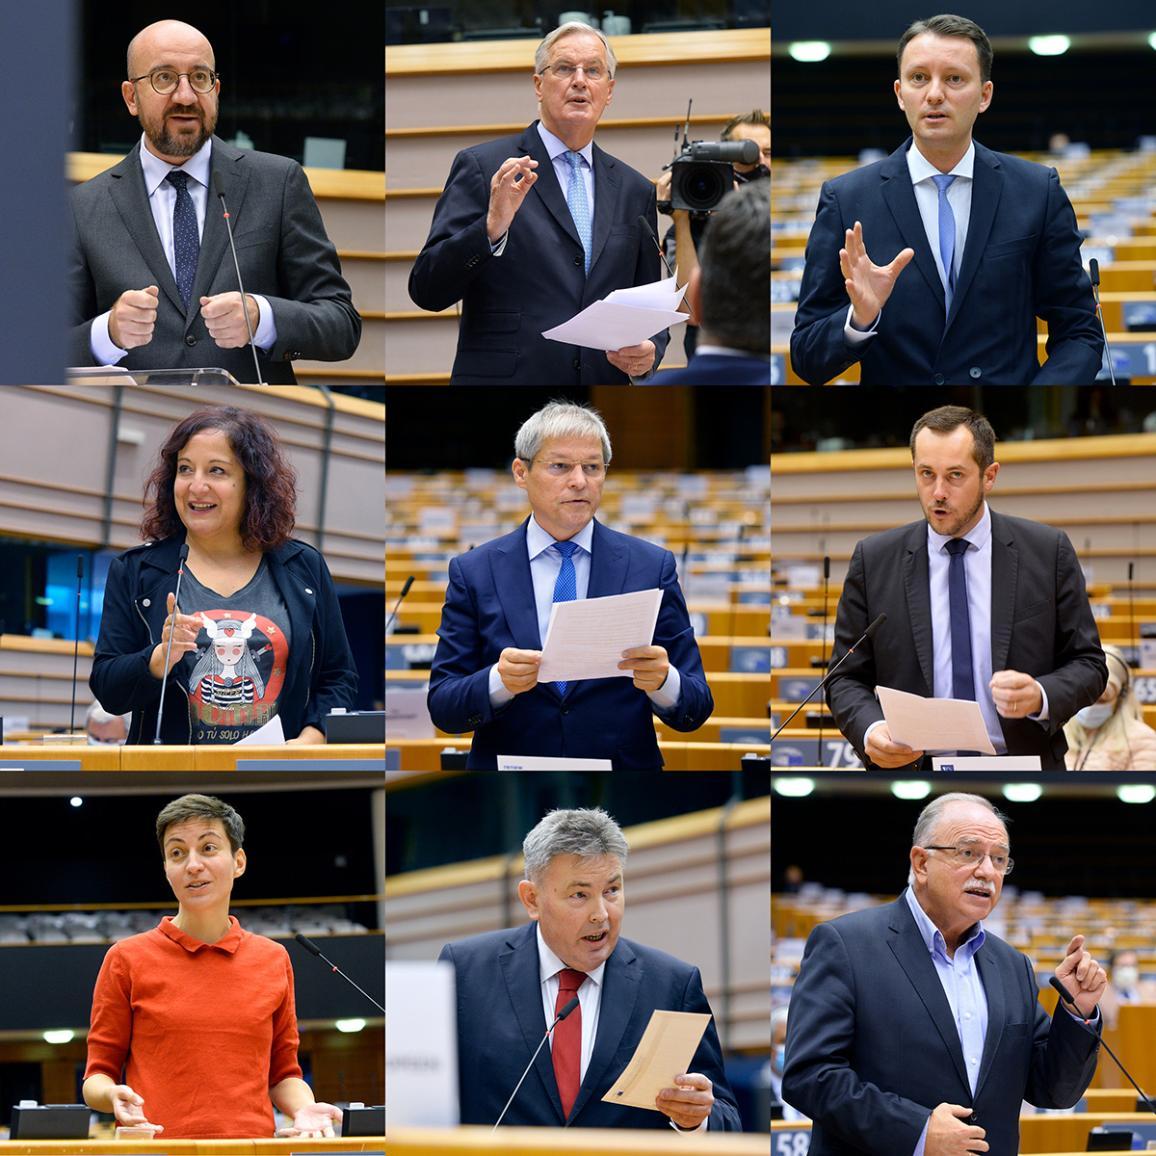 Plenary debate of 21 October 2020